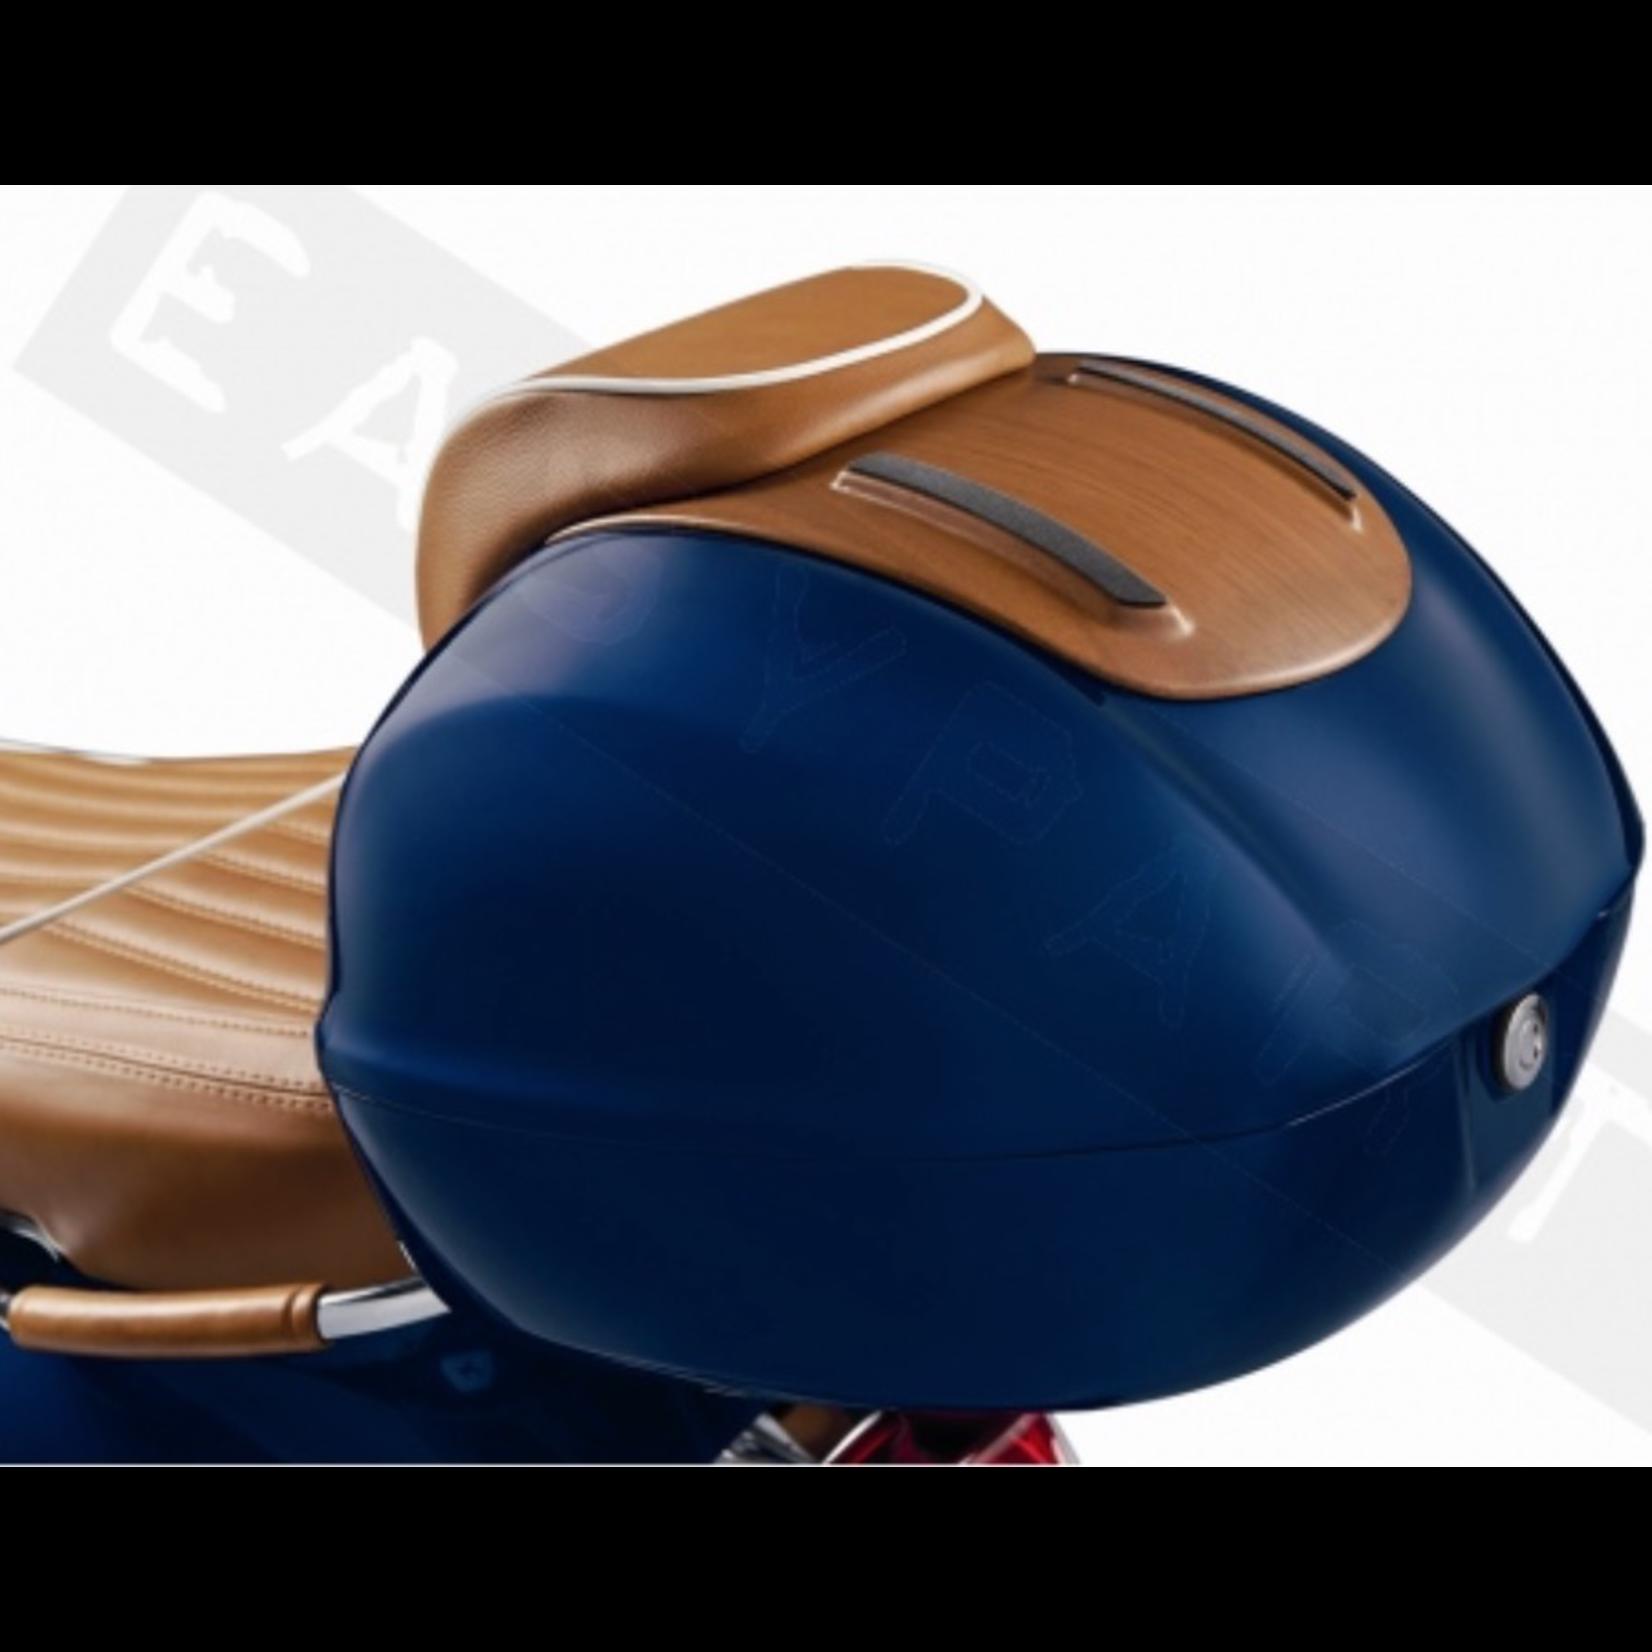 Accessories Luxury Woodgrain Top Case Trim